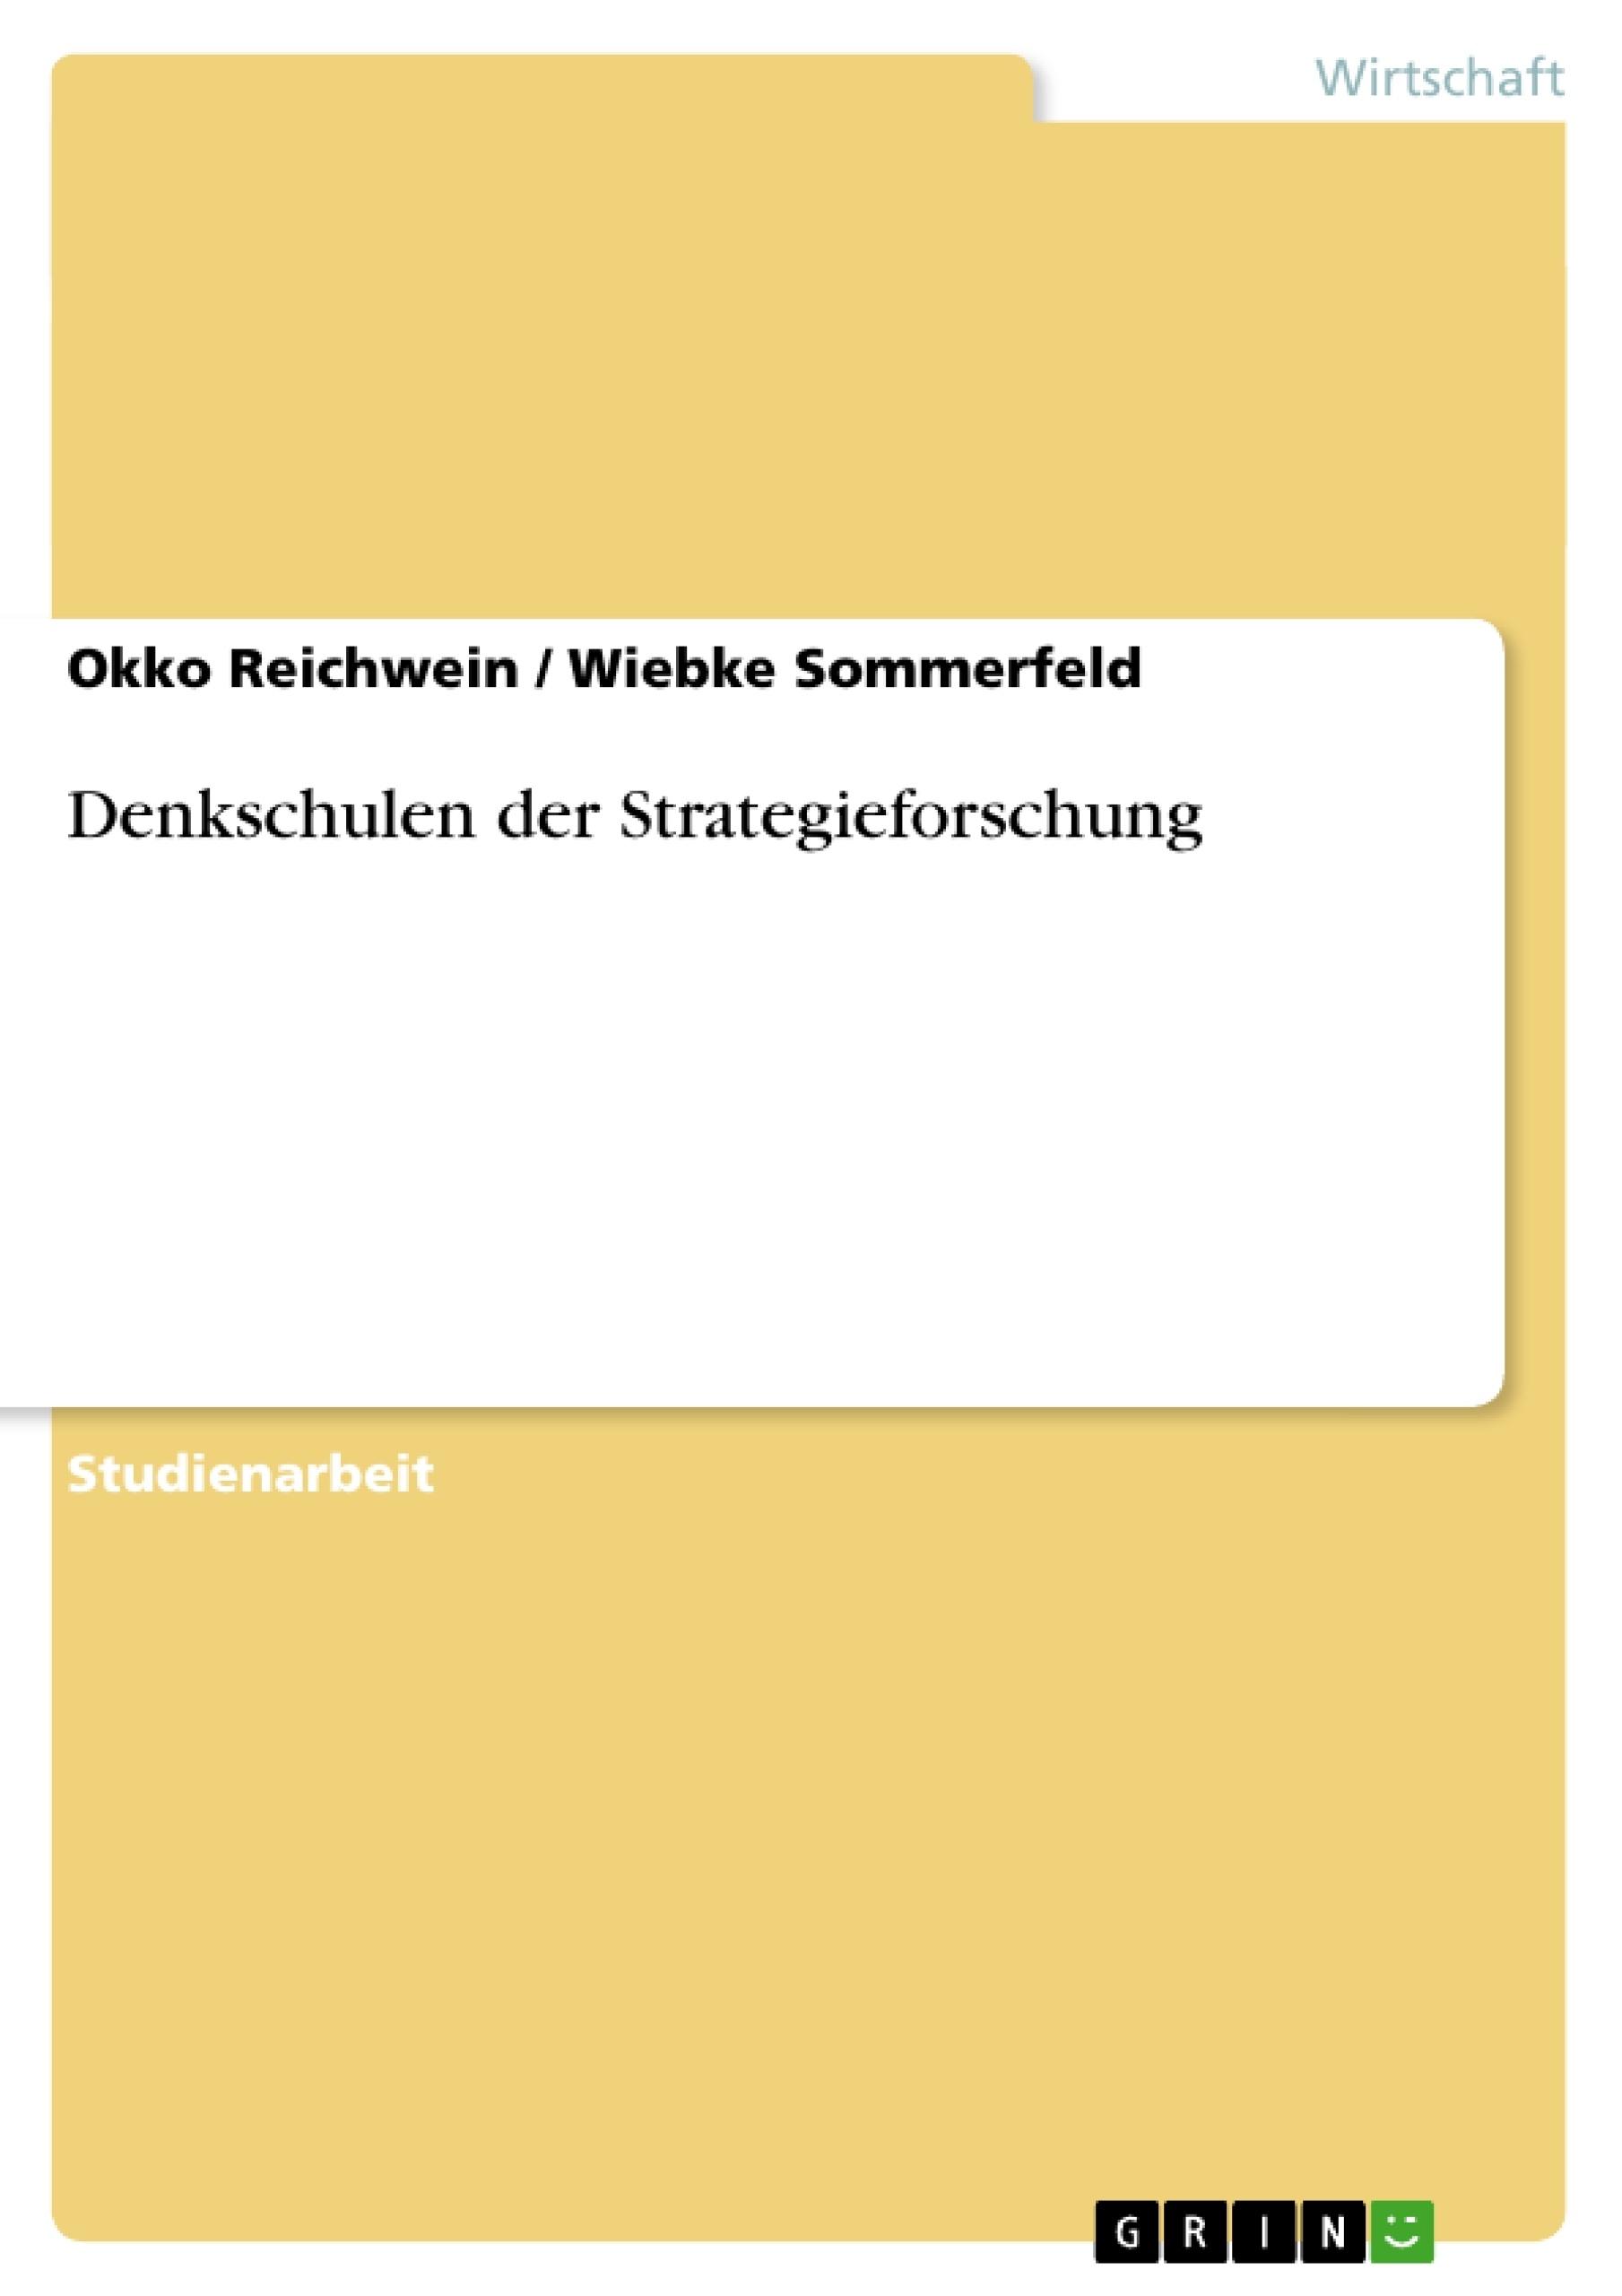 Titel: Denkschulen der Strategieforschung